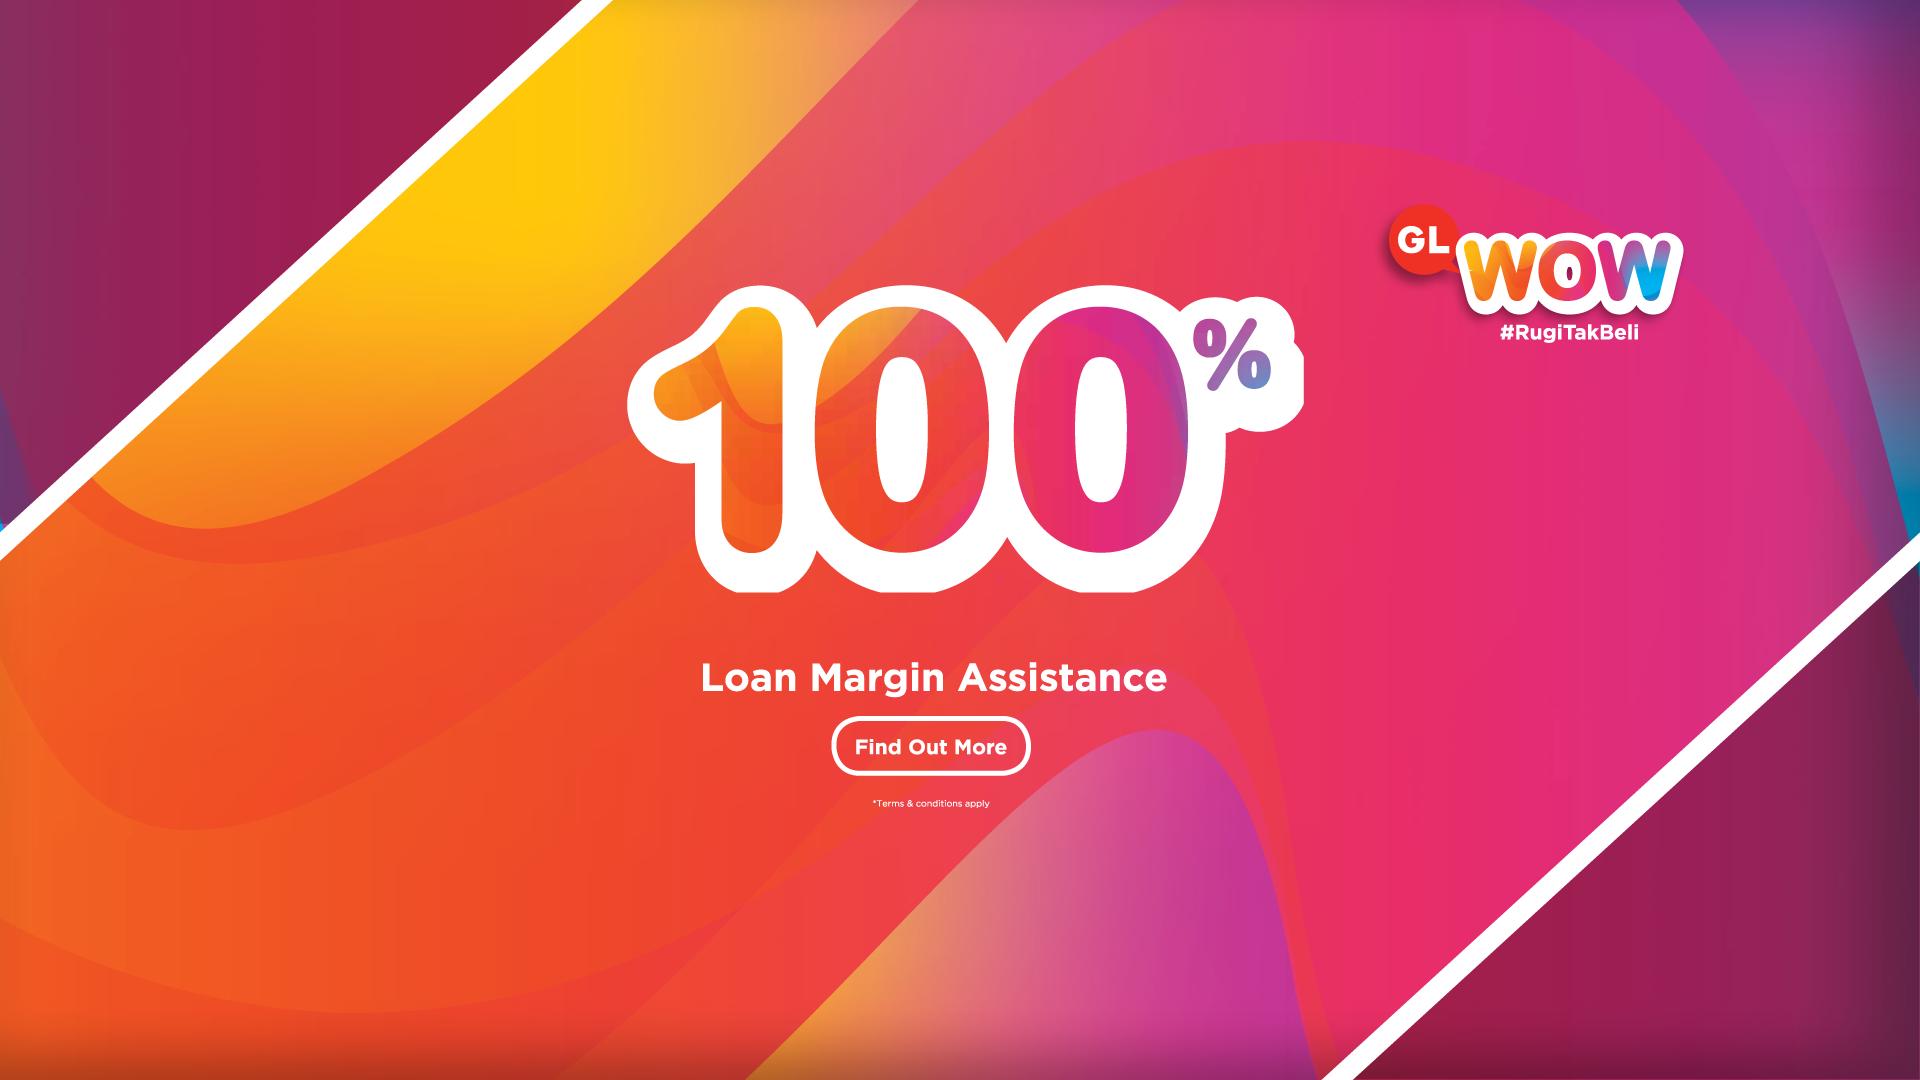 GL Wow 100% Financing V4